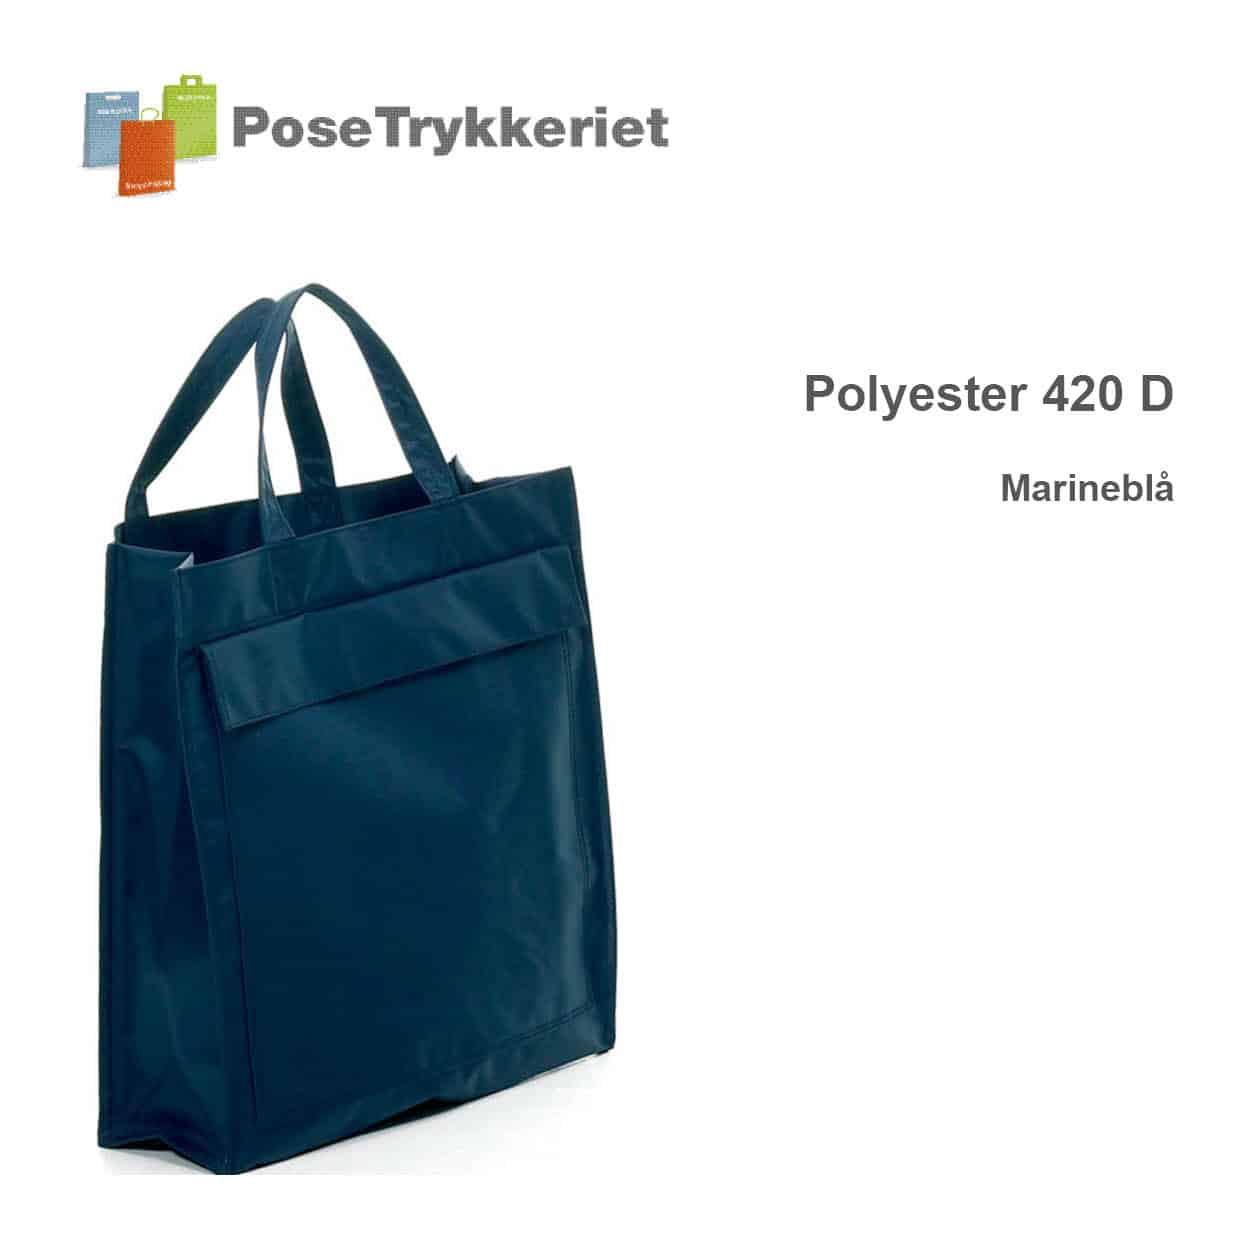 Marineblå revisorpose 420 D, PoseTrykkeriet.dk